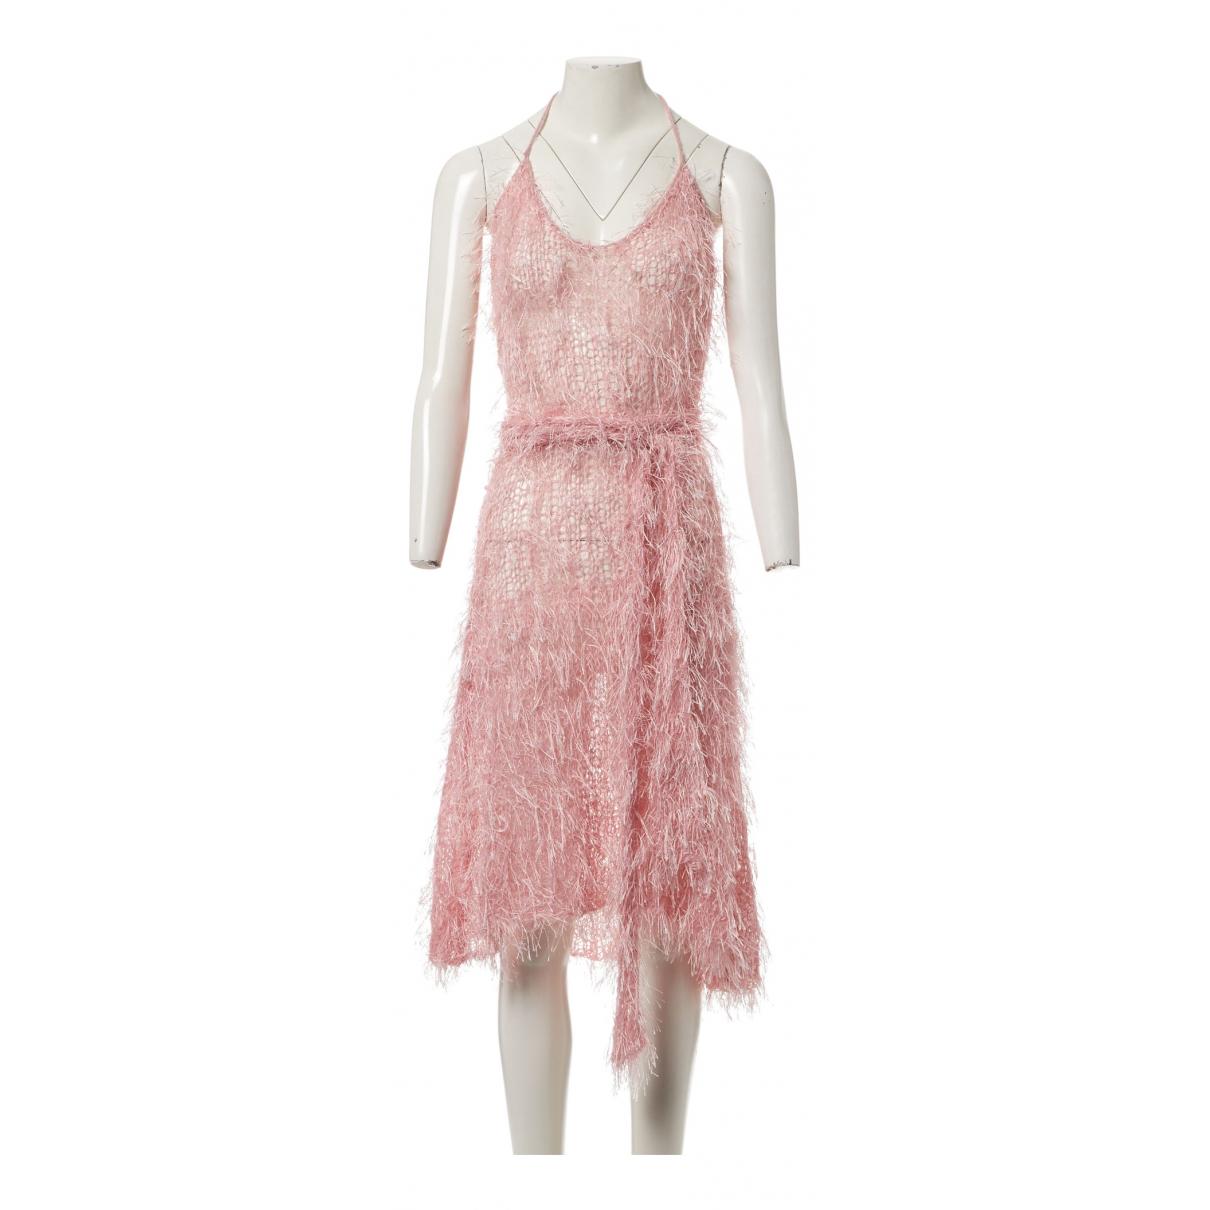 Rodarte \N Pink dress for Women S International